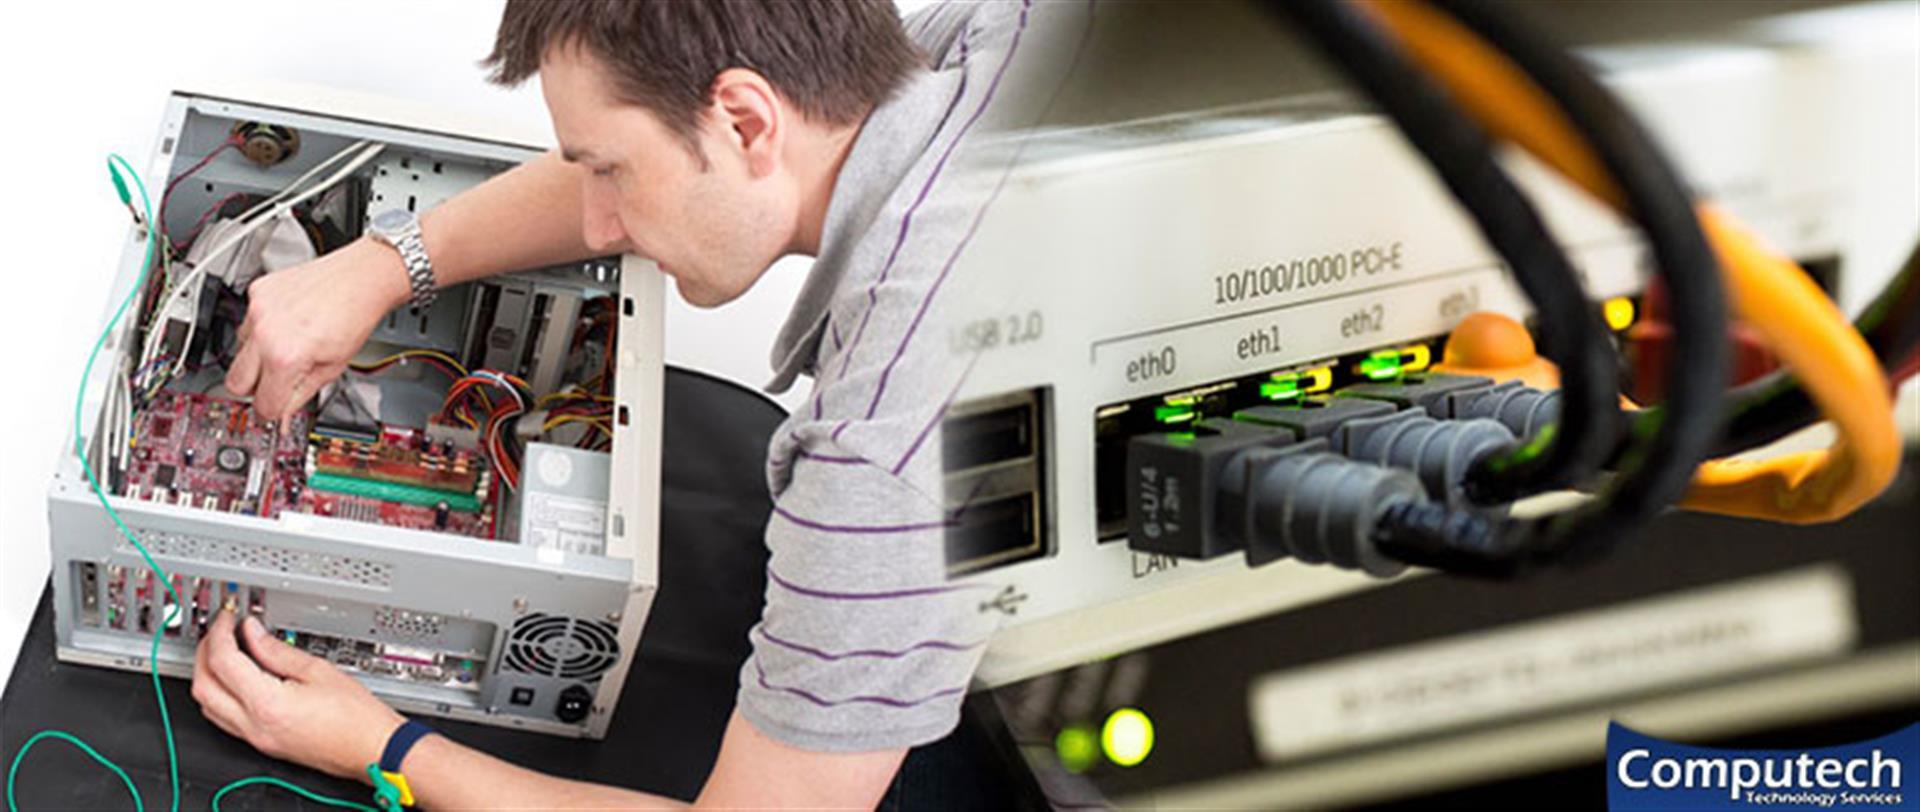 Grottoes Virginia Onsite Computer PC & Printer Repair, Network, Voice & Data Cabling Contractors